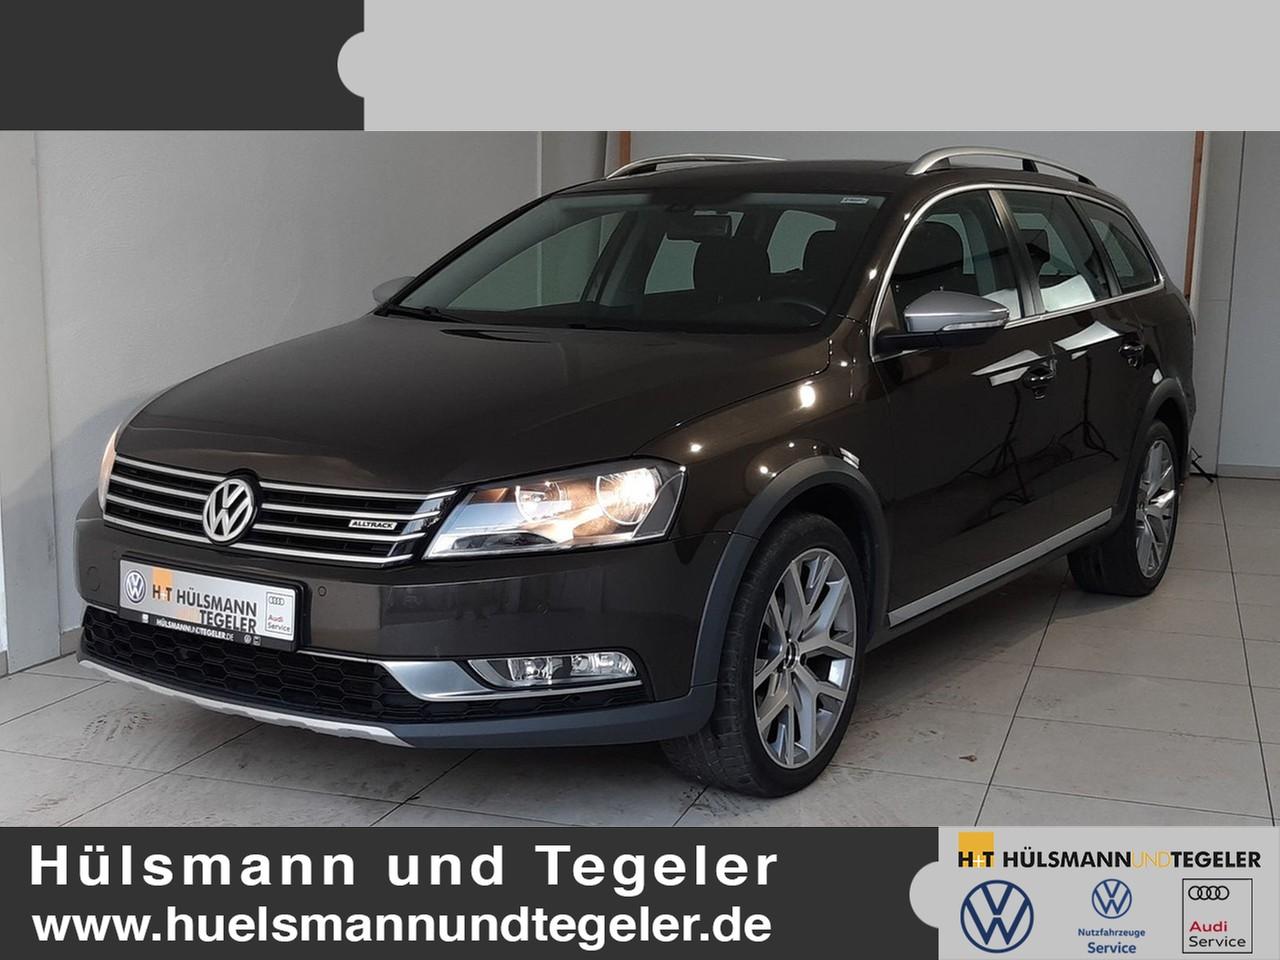 Volkswagen Passat Variant 2.0 TDI DSG 4MOTION Alltrack, Jahr 2013, Diesel